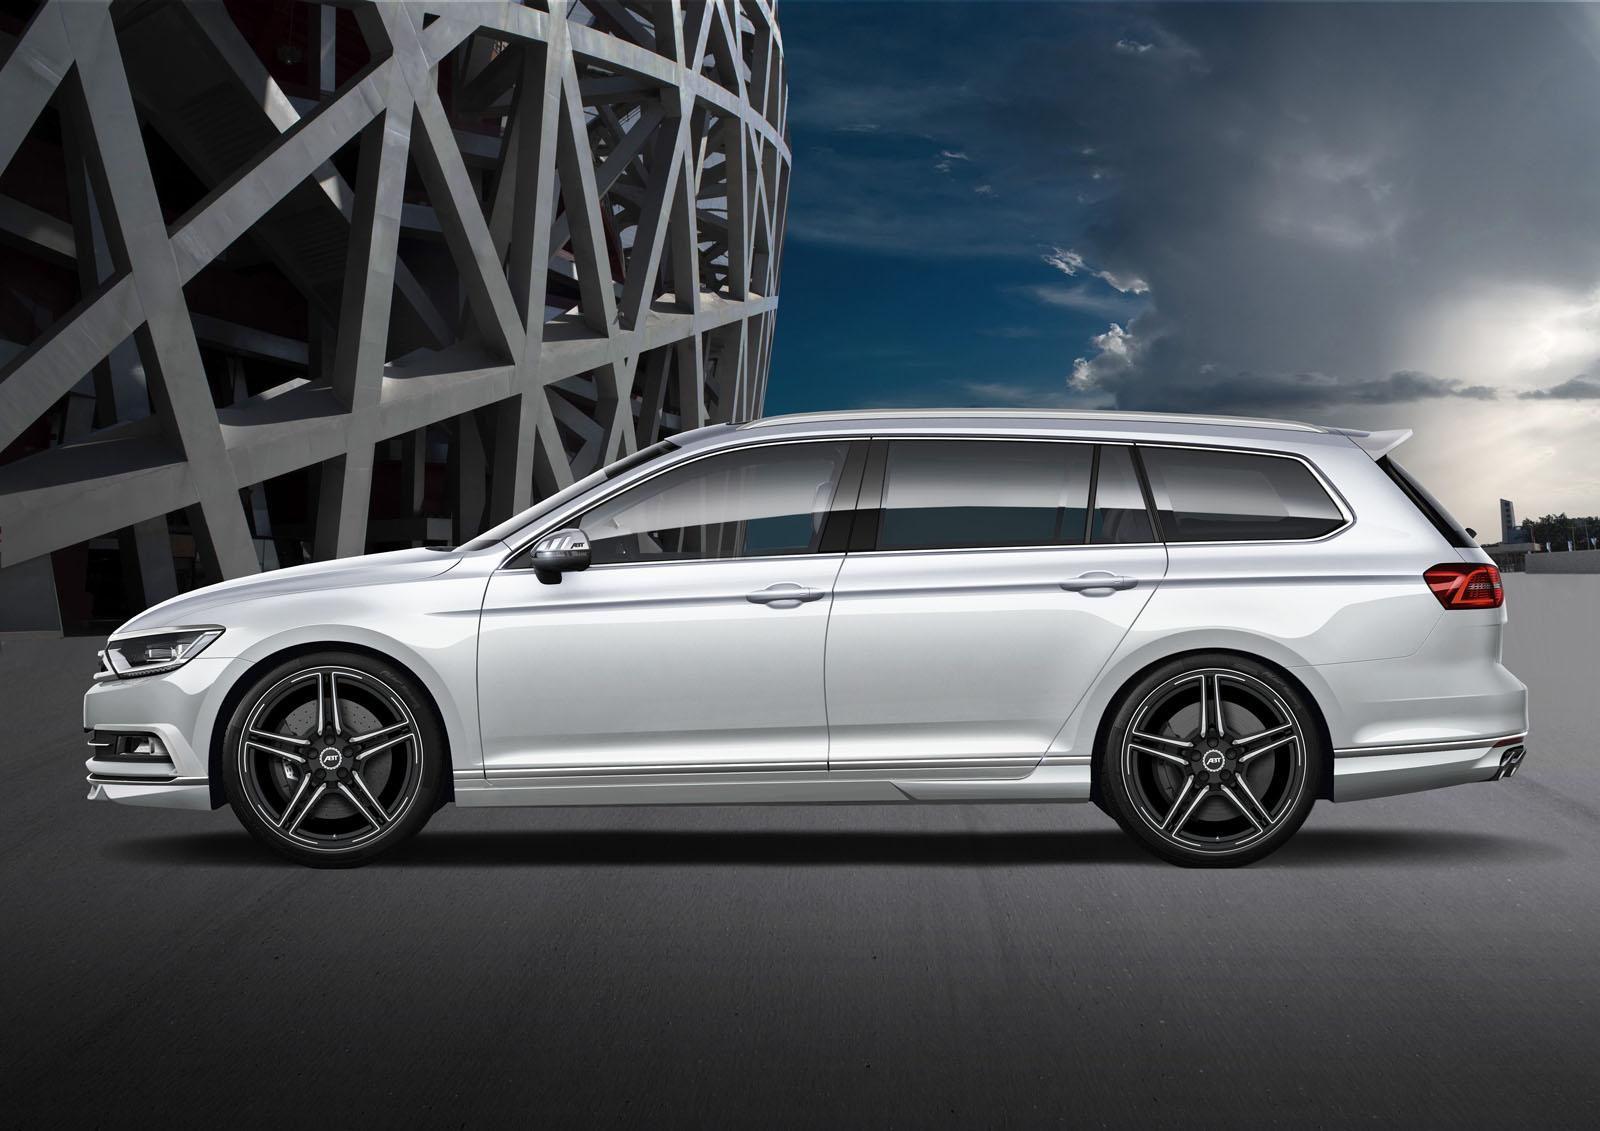 Diesel Wallpaper Cars 2015 Volkswagen Passat 2 0 Bitdi Tuned To 280 Hp By Abt